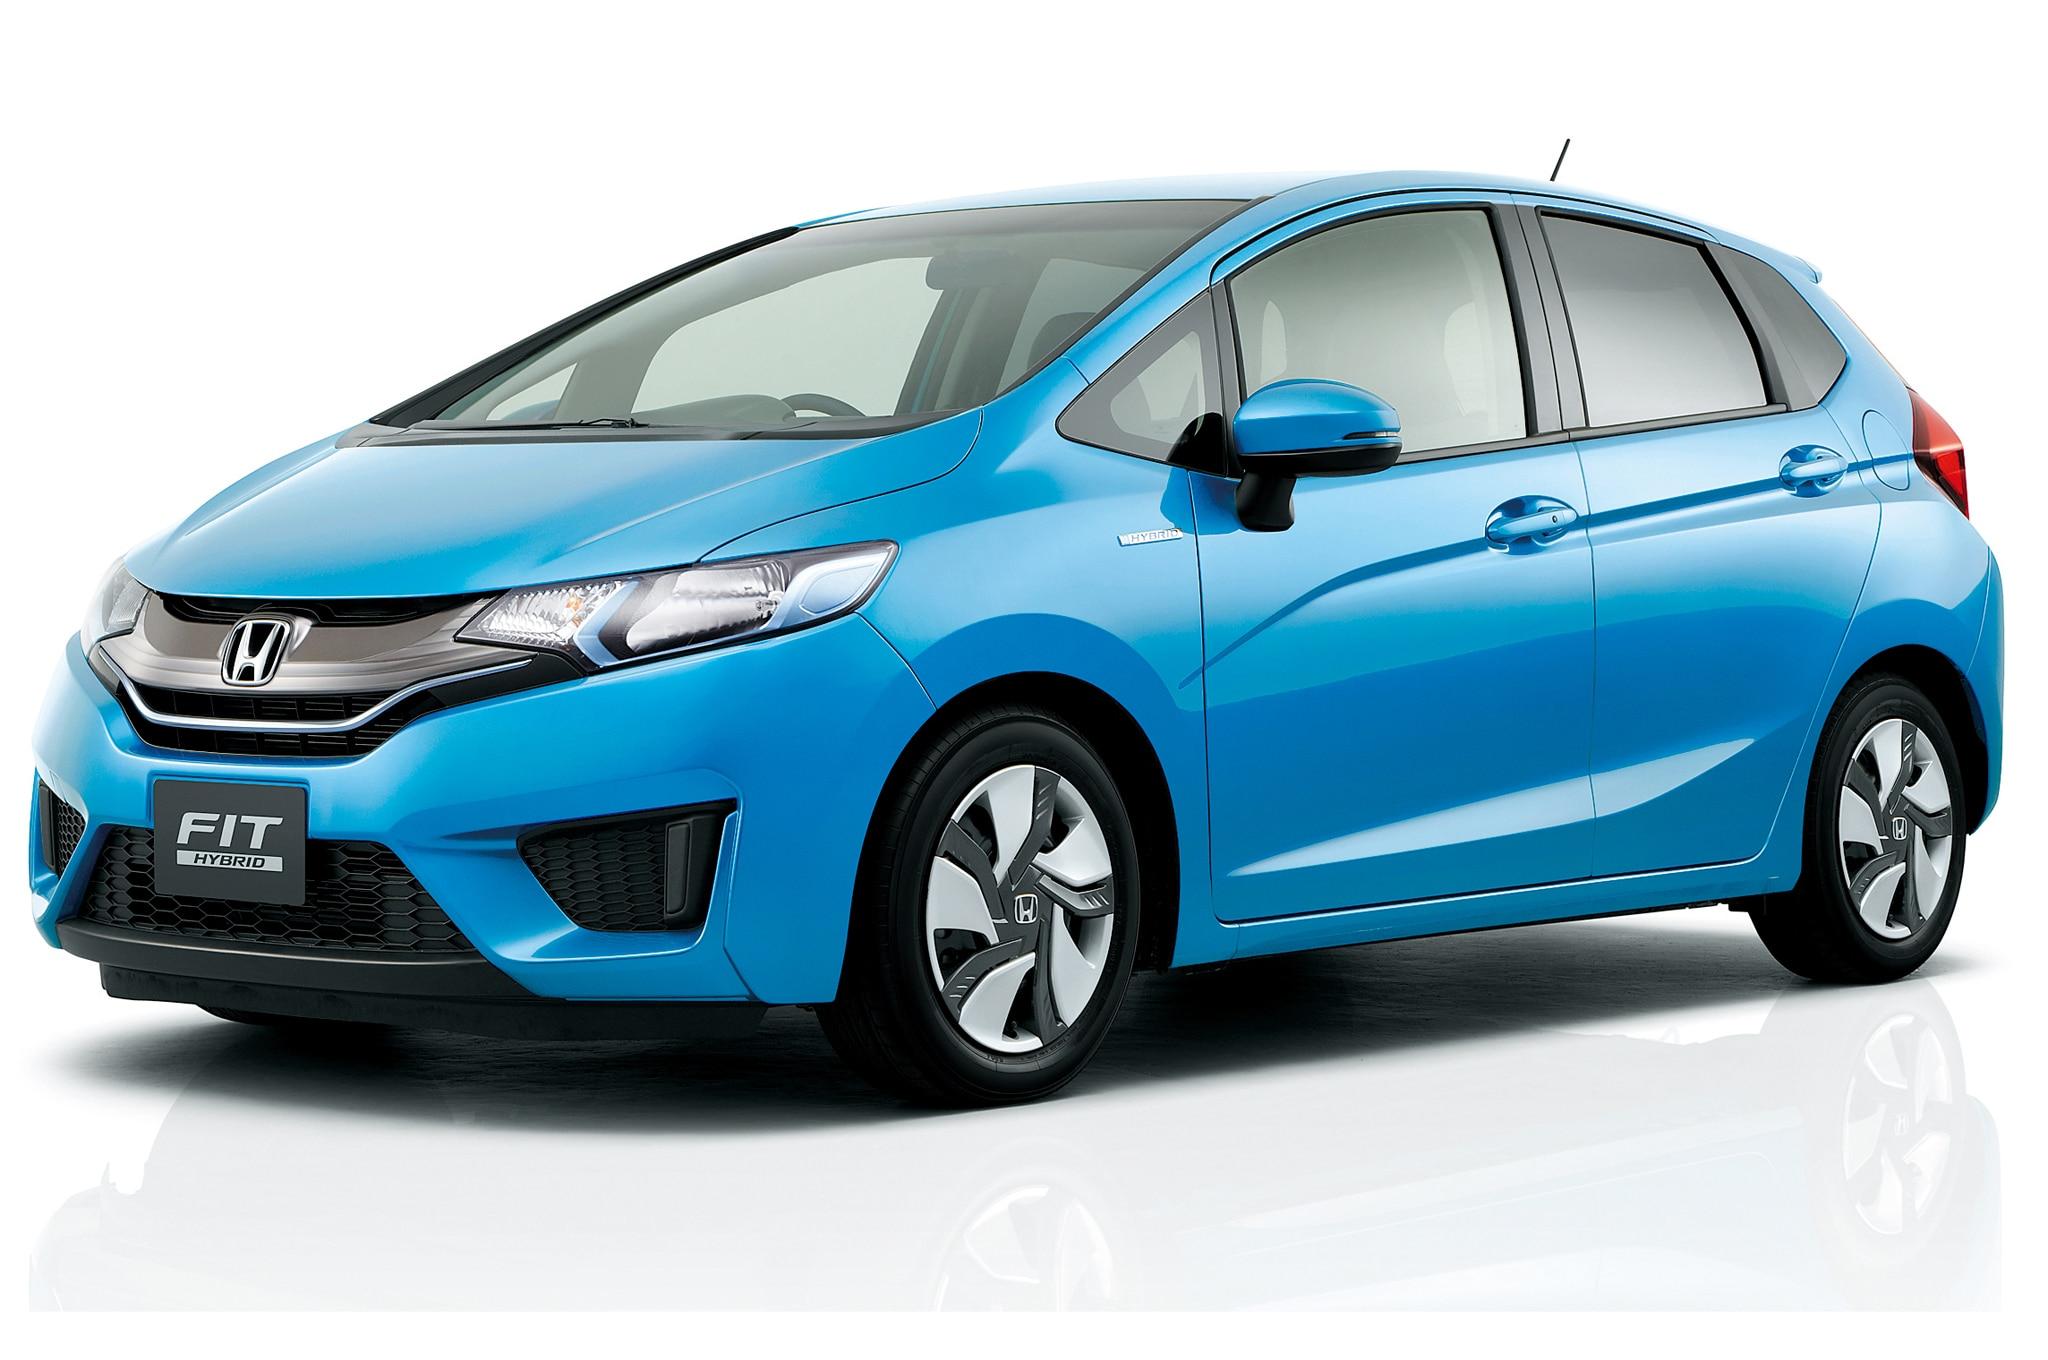 2015 Honda Fit Hybrid Front Three Quarters21